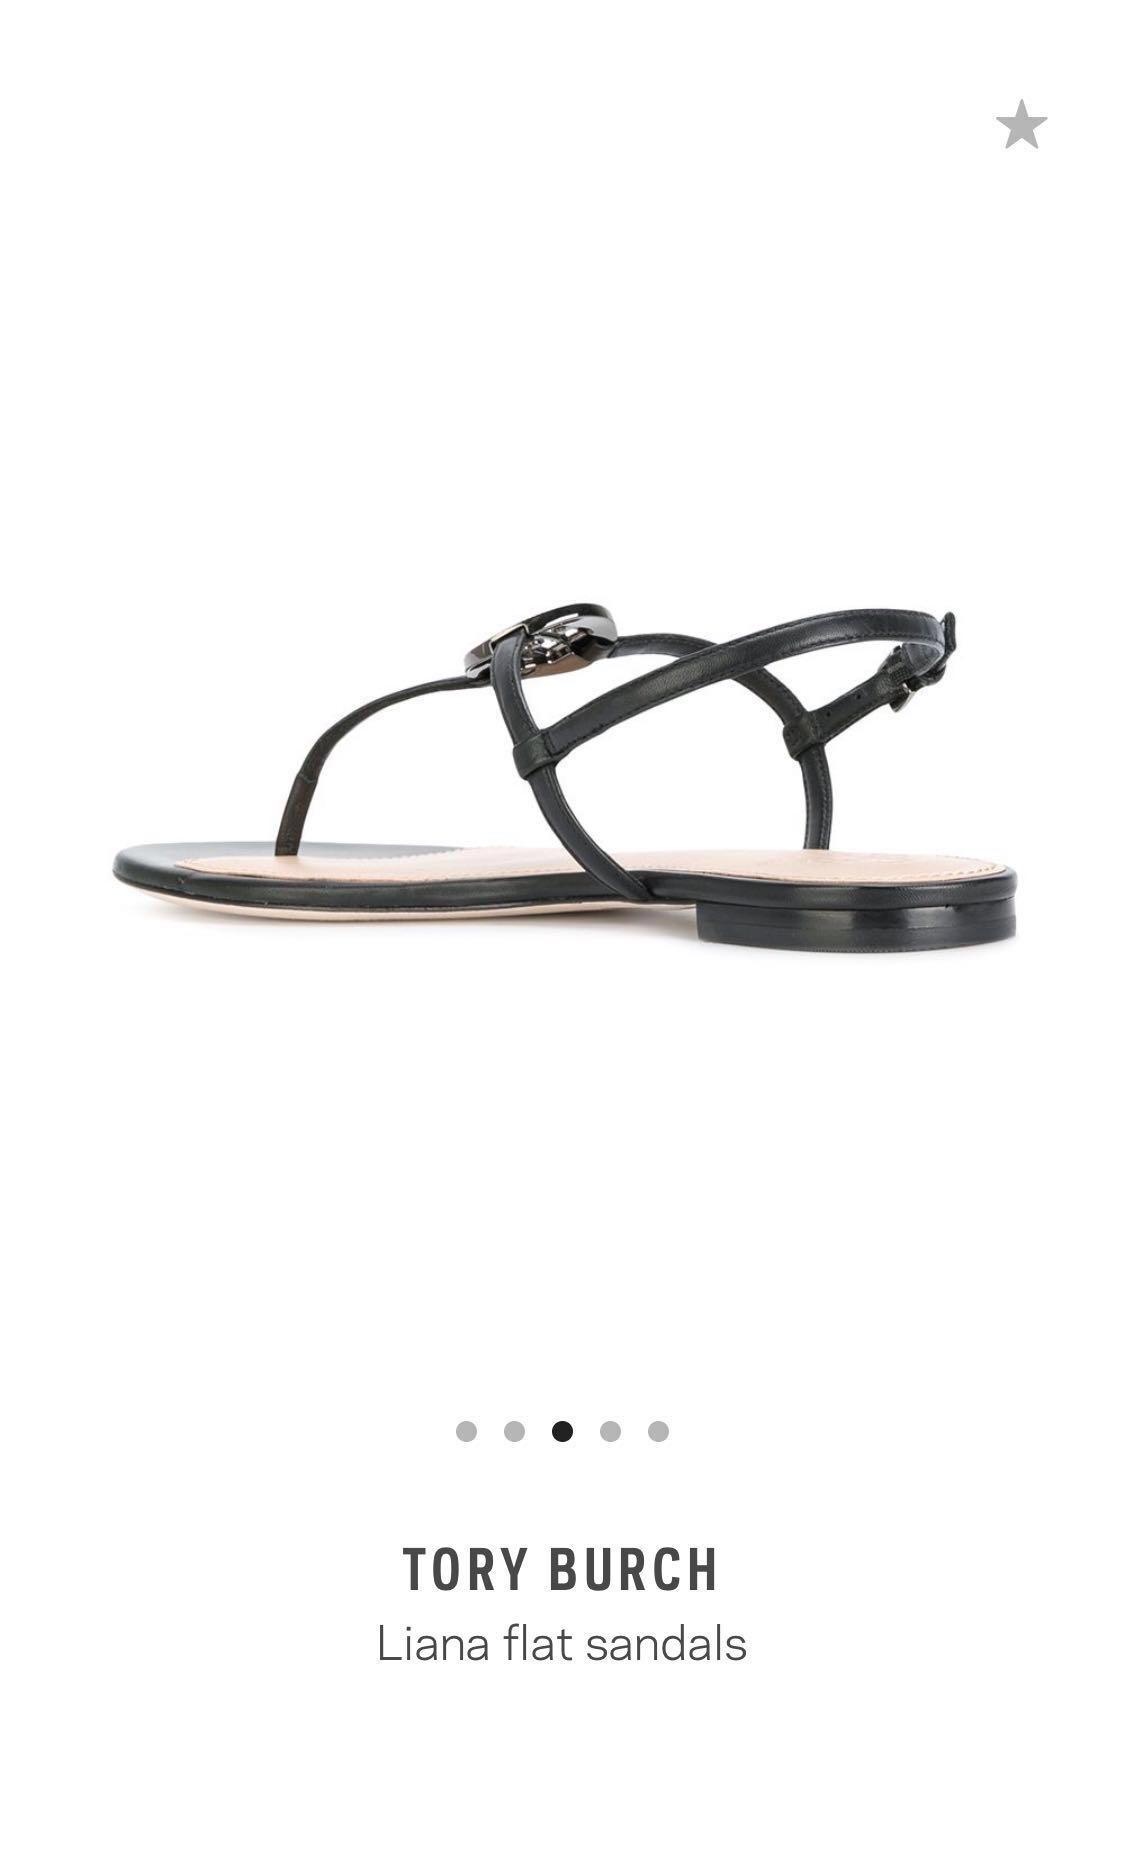 a423200f0 Tory Burch Liana Flat Sandals